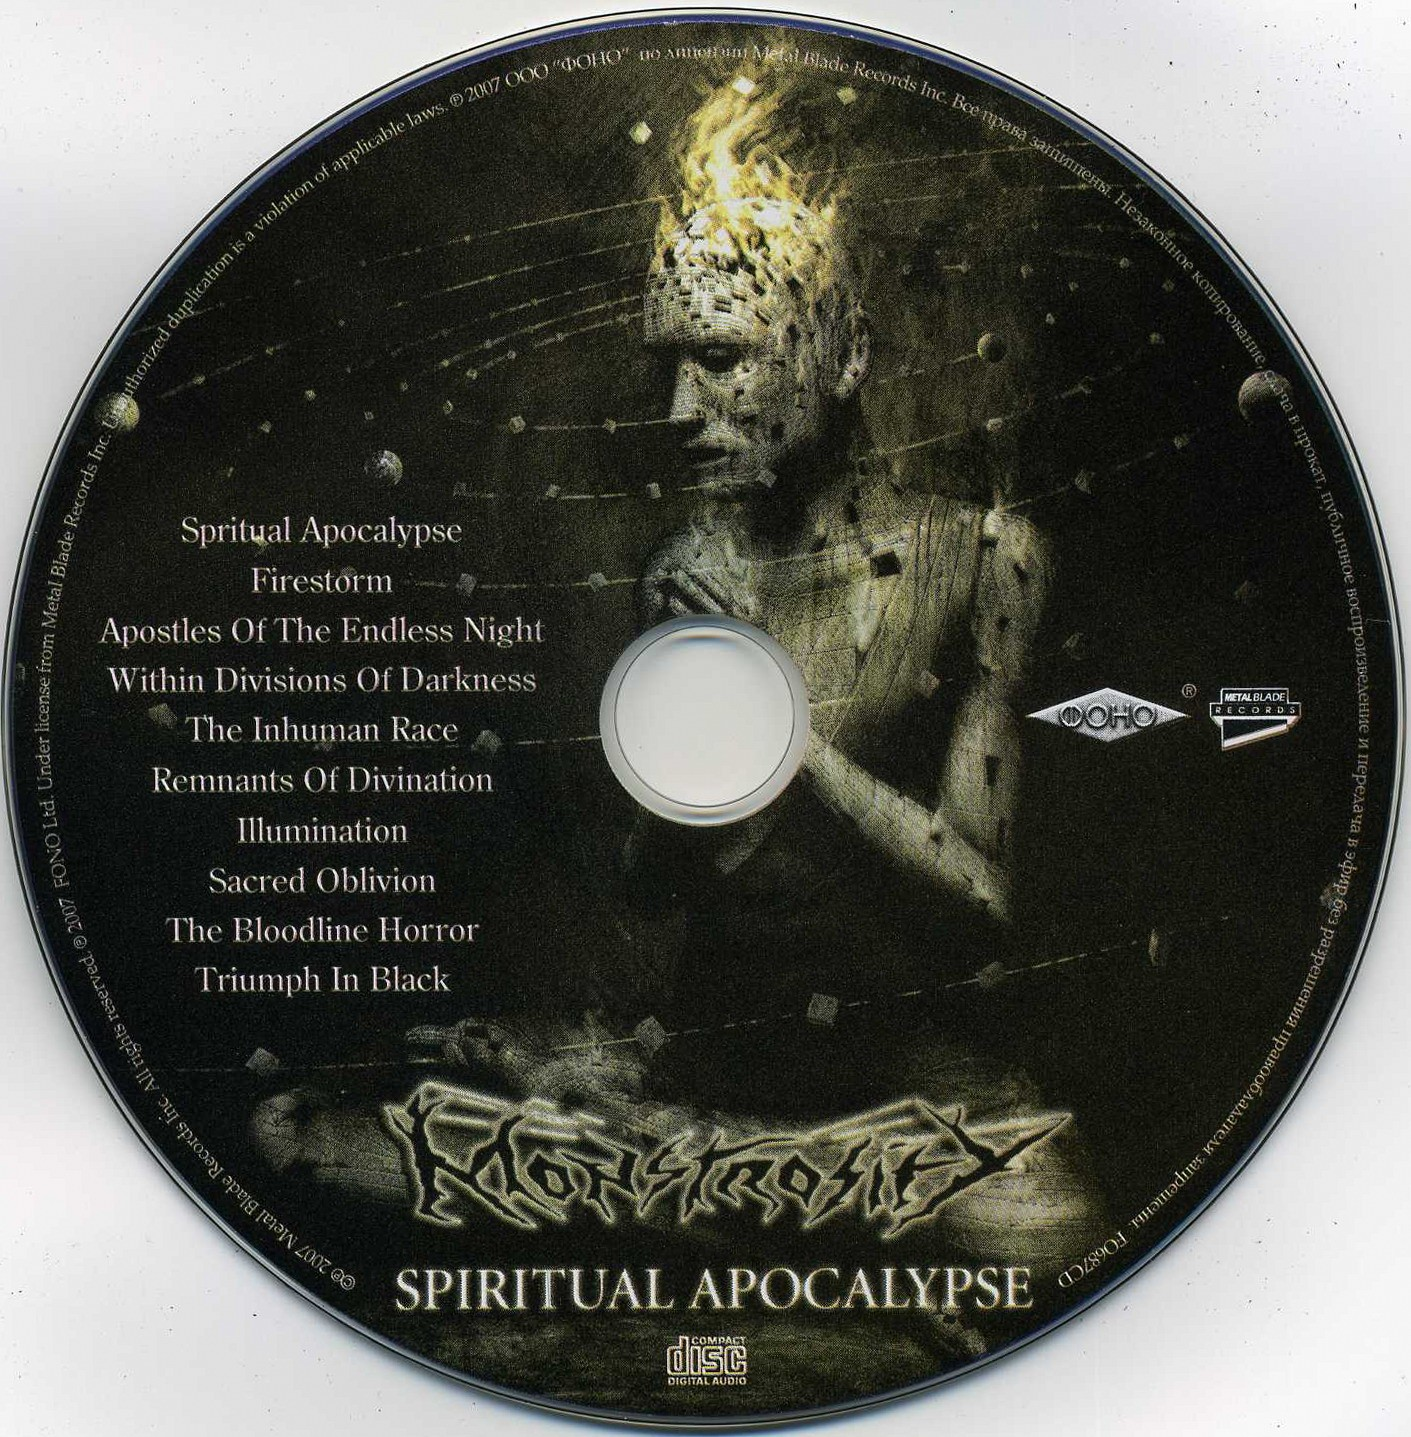 Spiritual Apocalypse Monstrosity: SONIDOSZERO -- METAL FREE MP3: Monstrosity